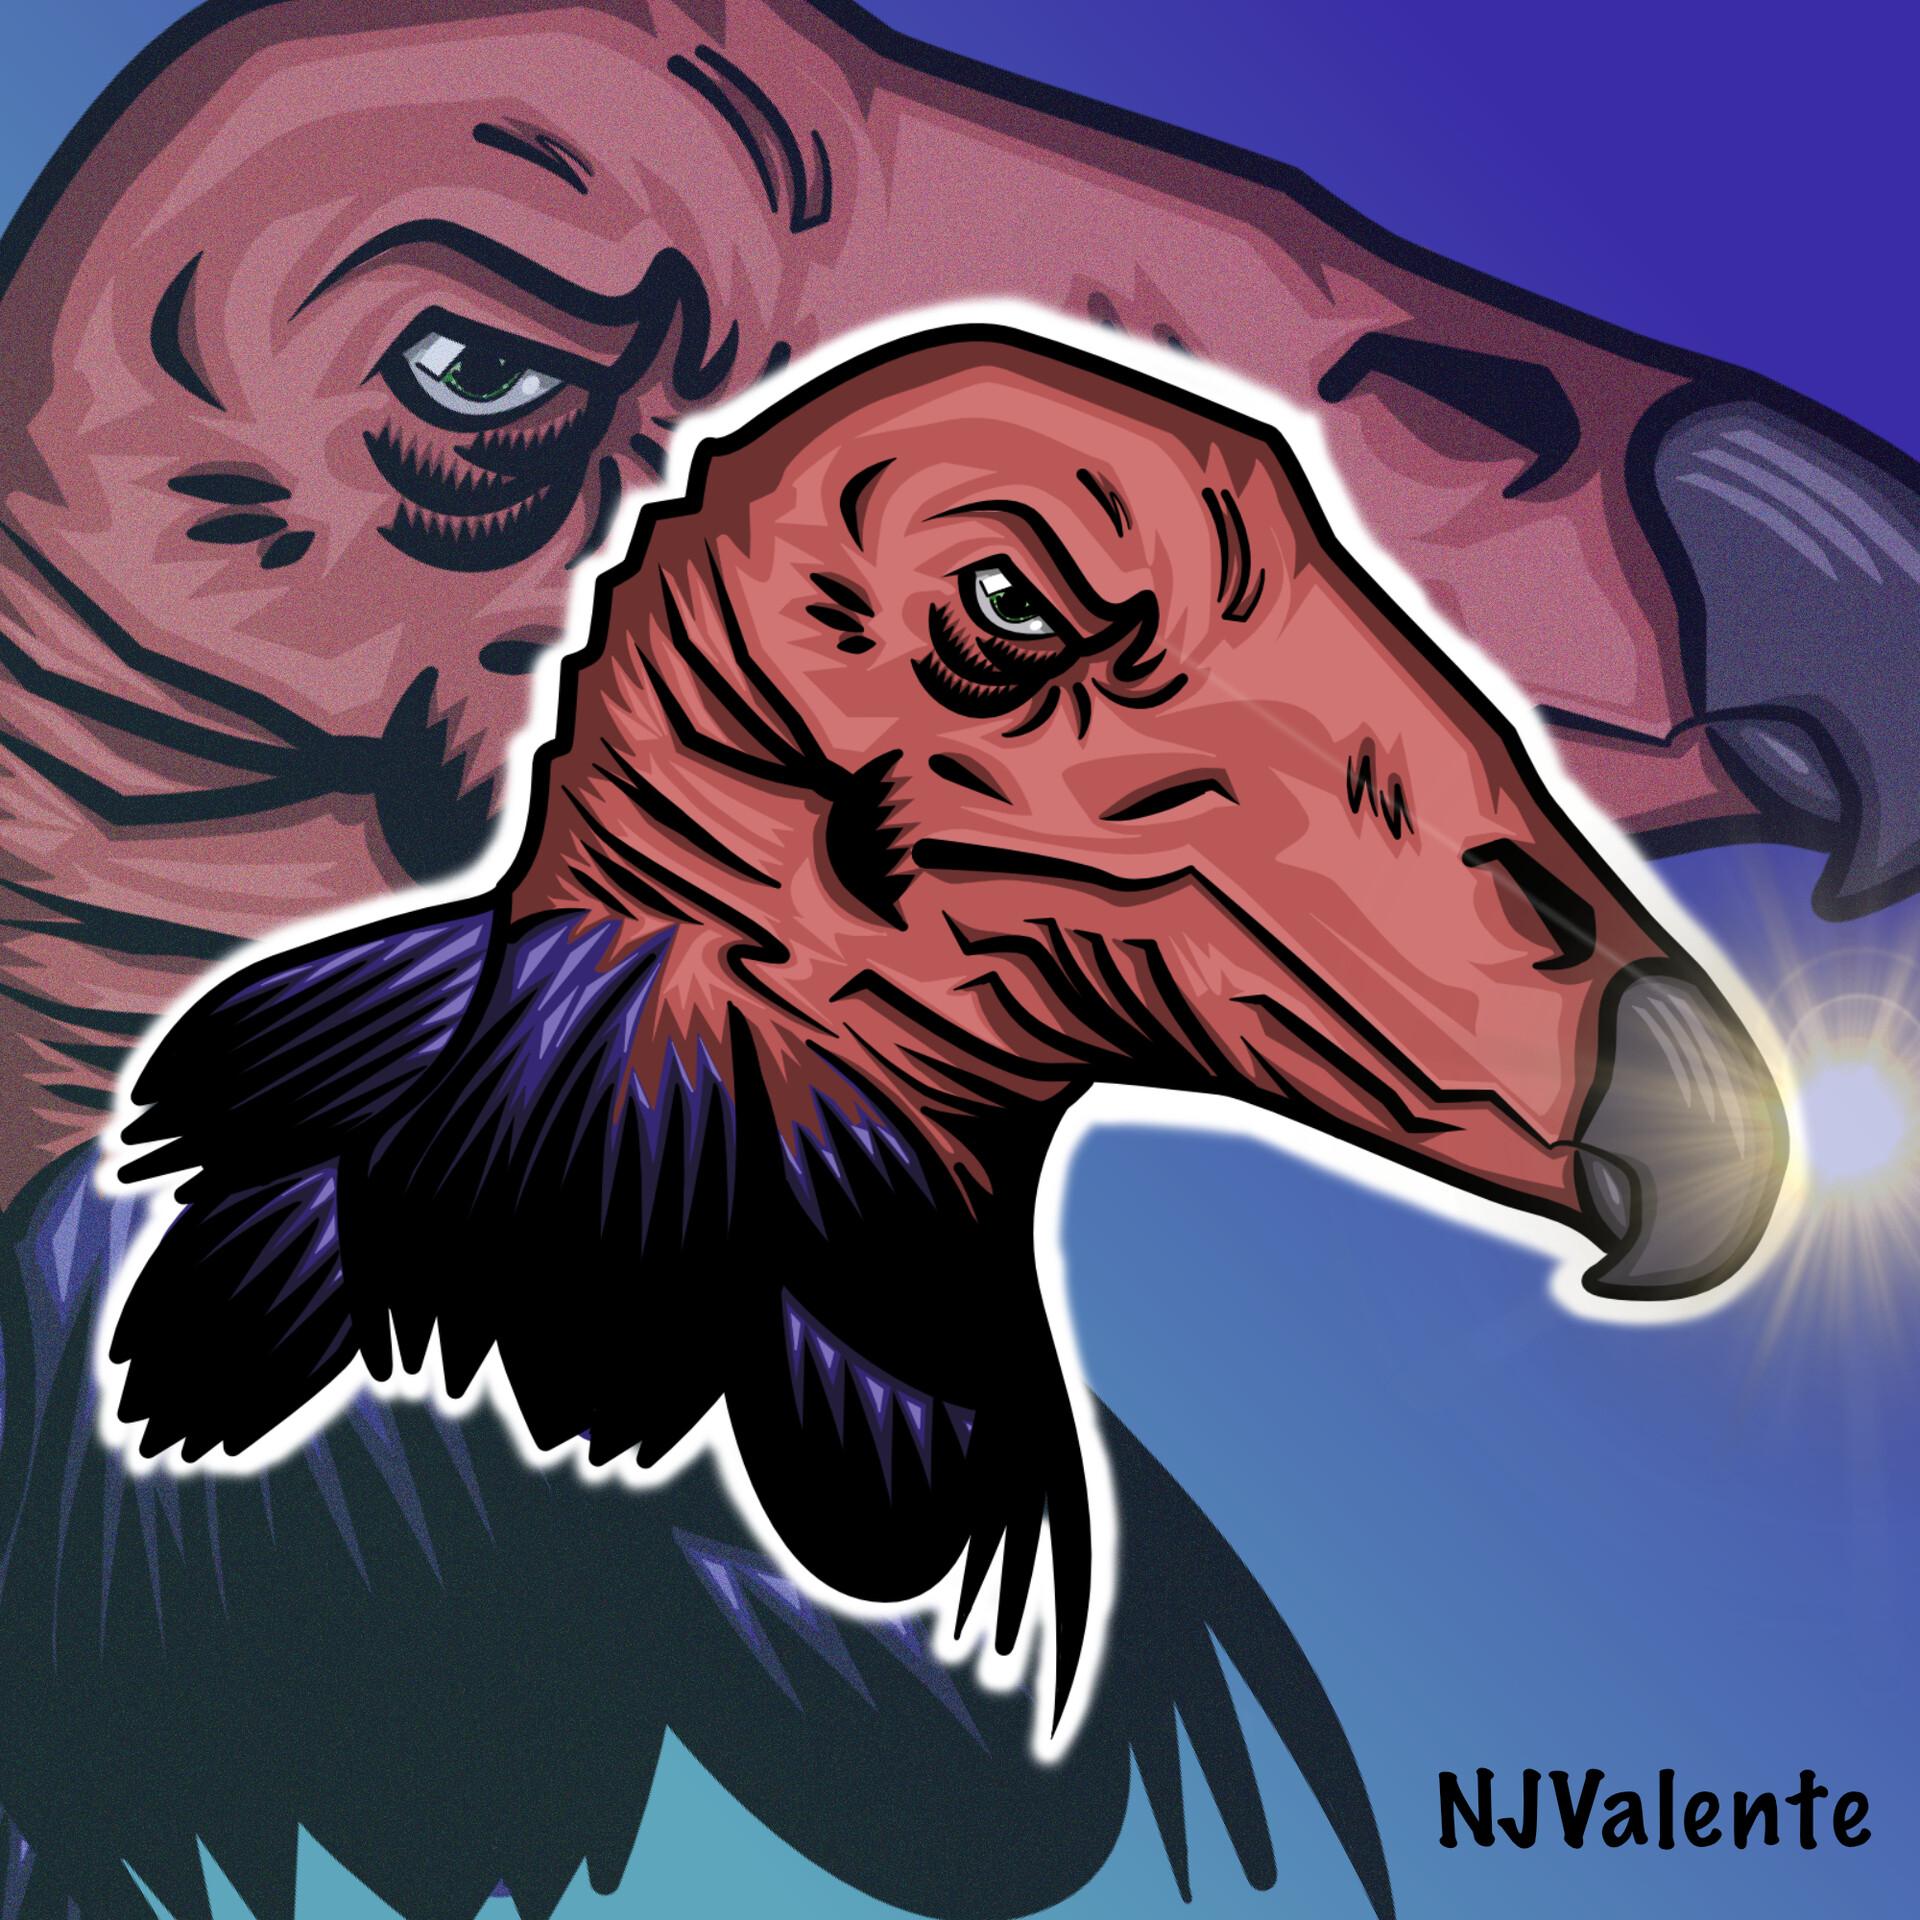 Nick valente vulture